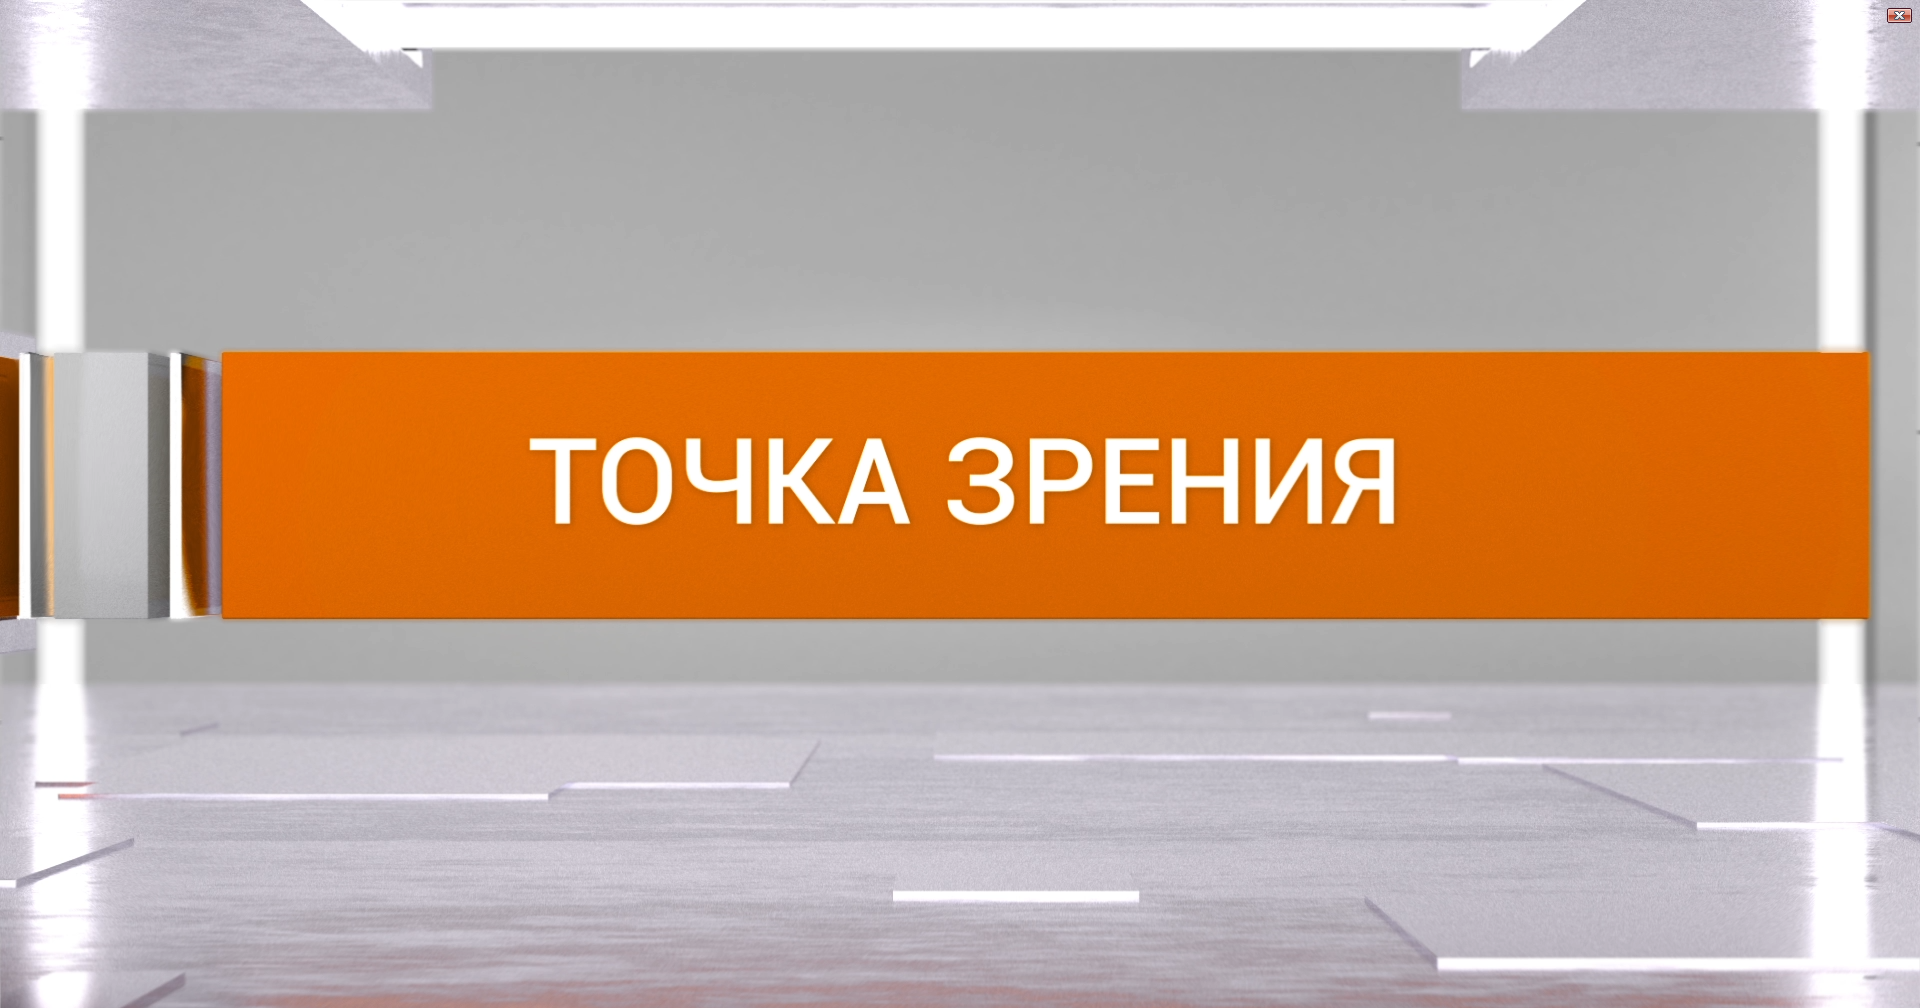 https://inbusiness.kz/ru/images/original/19/images/tgnNAvCw.png